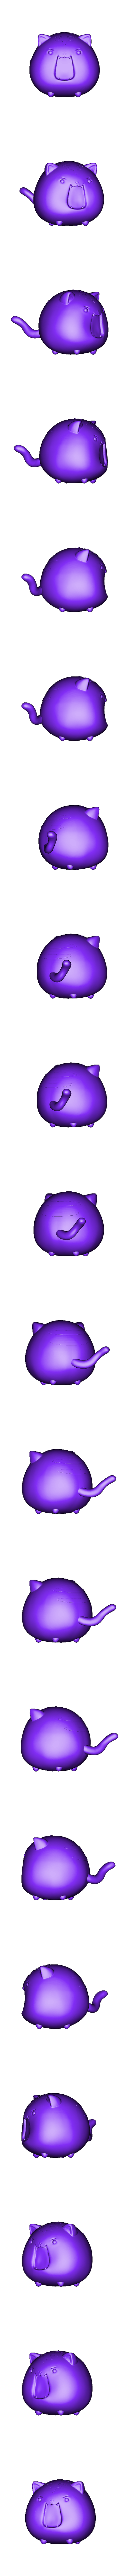 cute_tiger.stl Download STL file cute tiger printable 3D print model • 3D printable object, Kownus